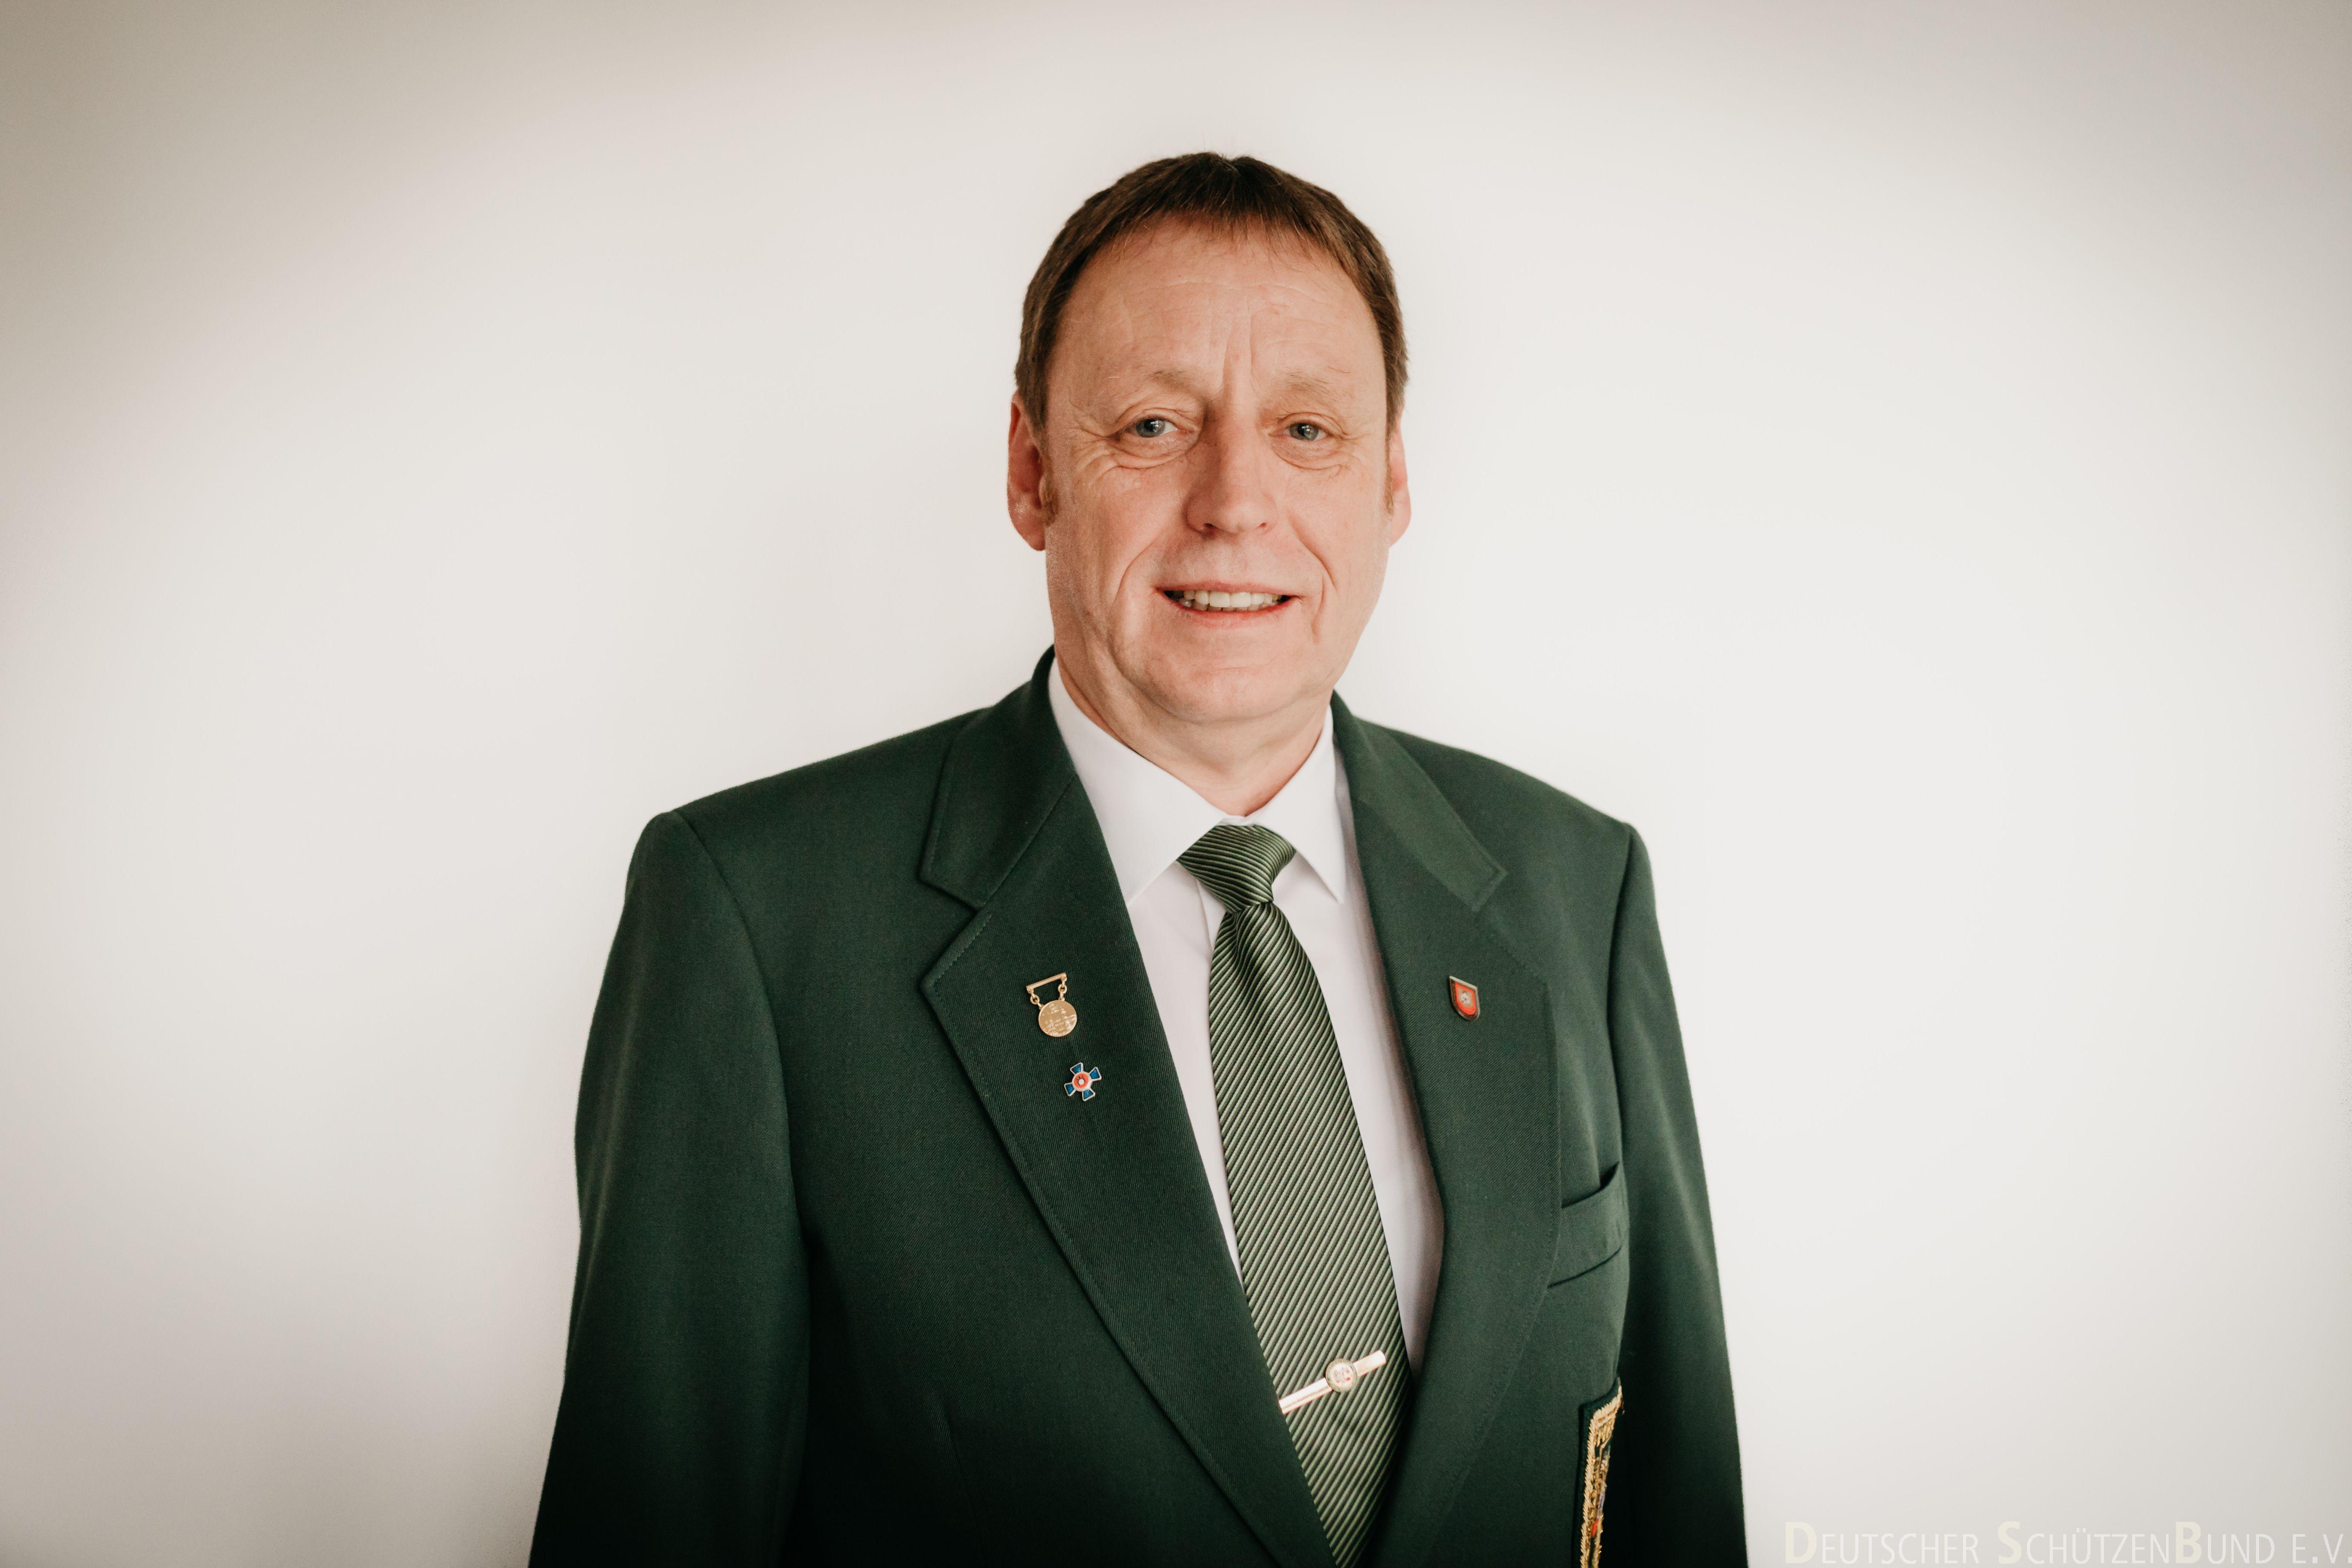 Wilfried Ritzke - Vizepräsident Schützentradition / Brauchtum